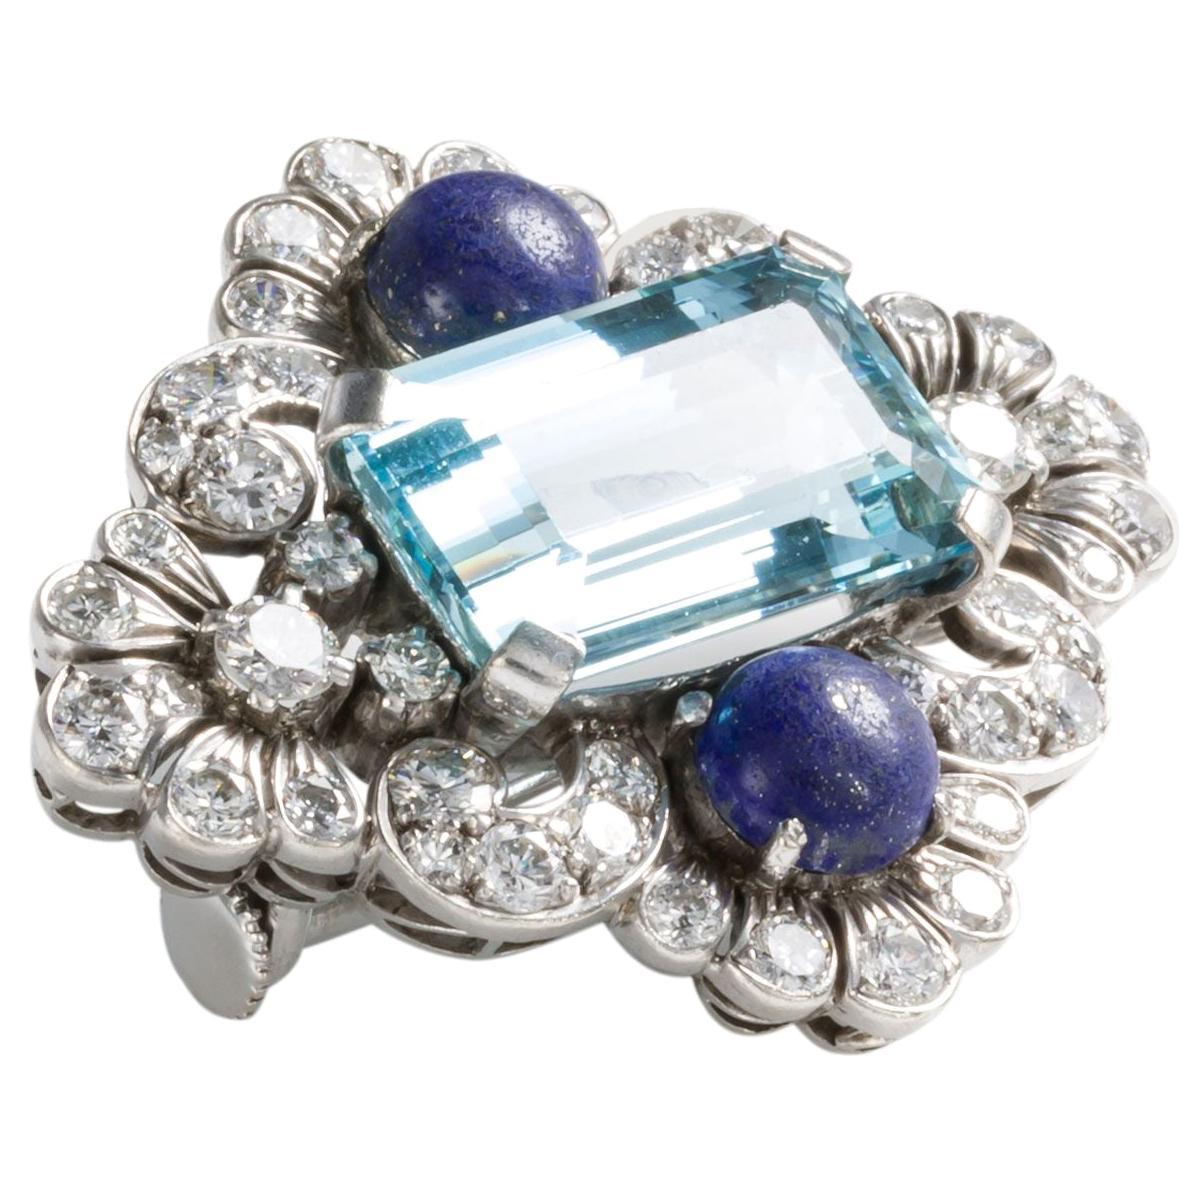 18 Karat White Gold, Aquamarine, Lapis and Diamond Brooch Pin